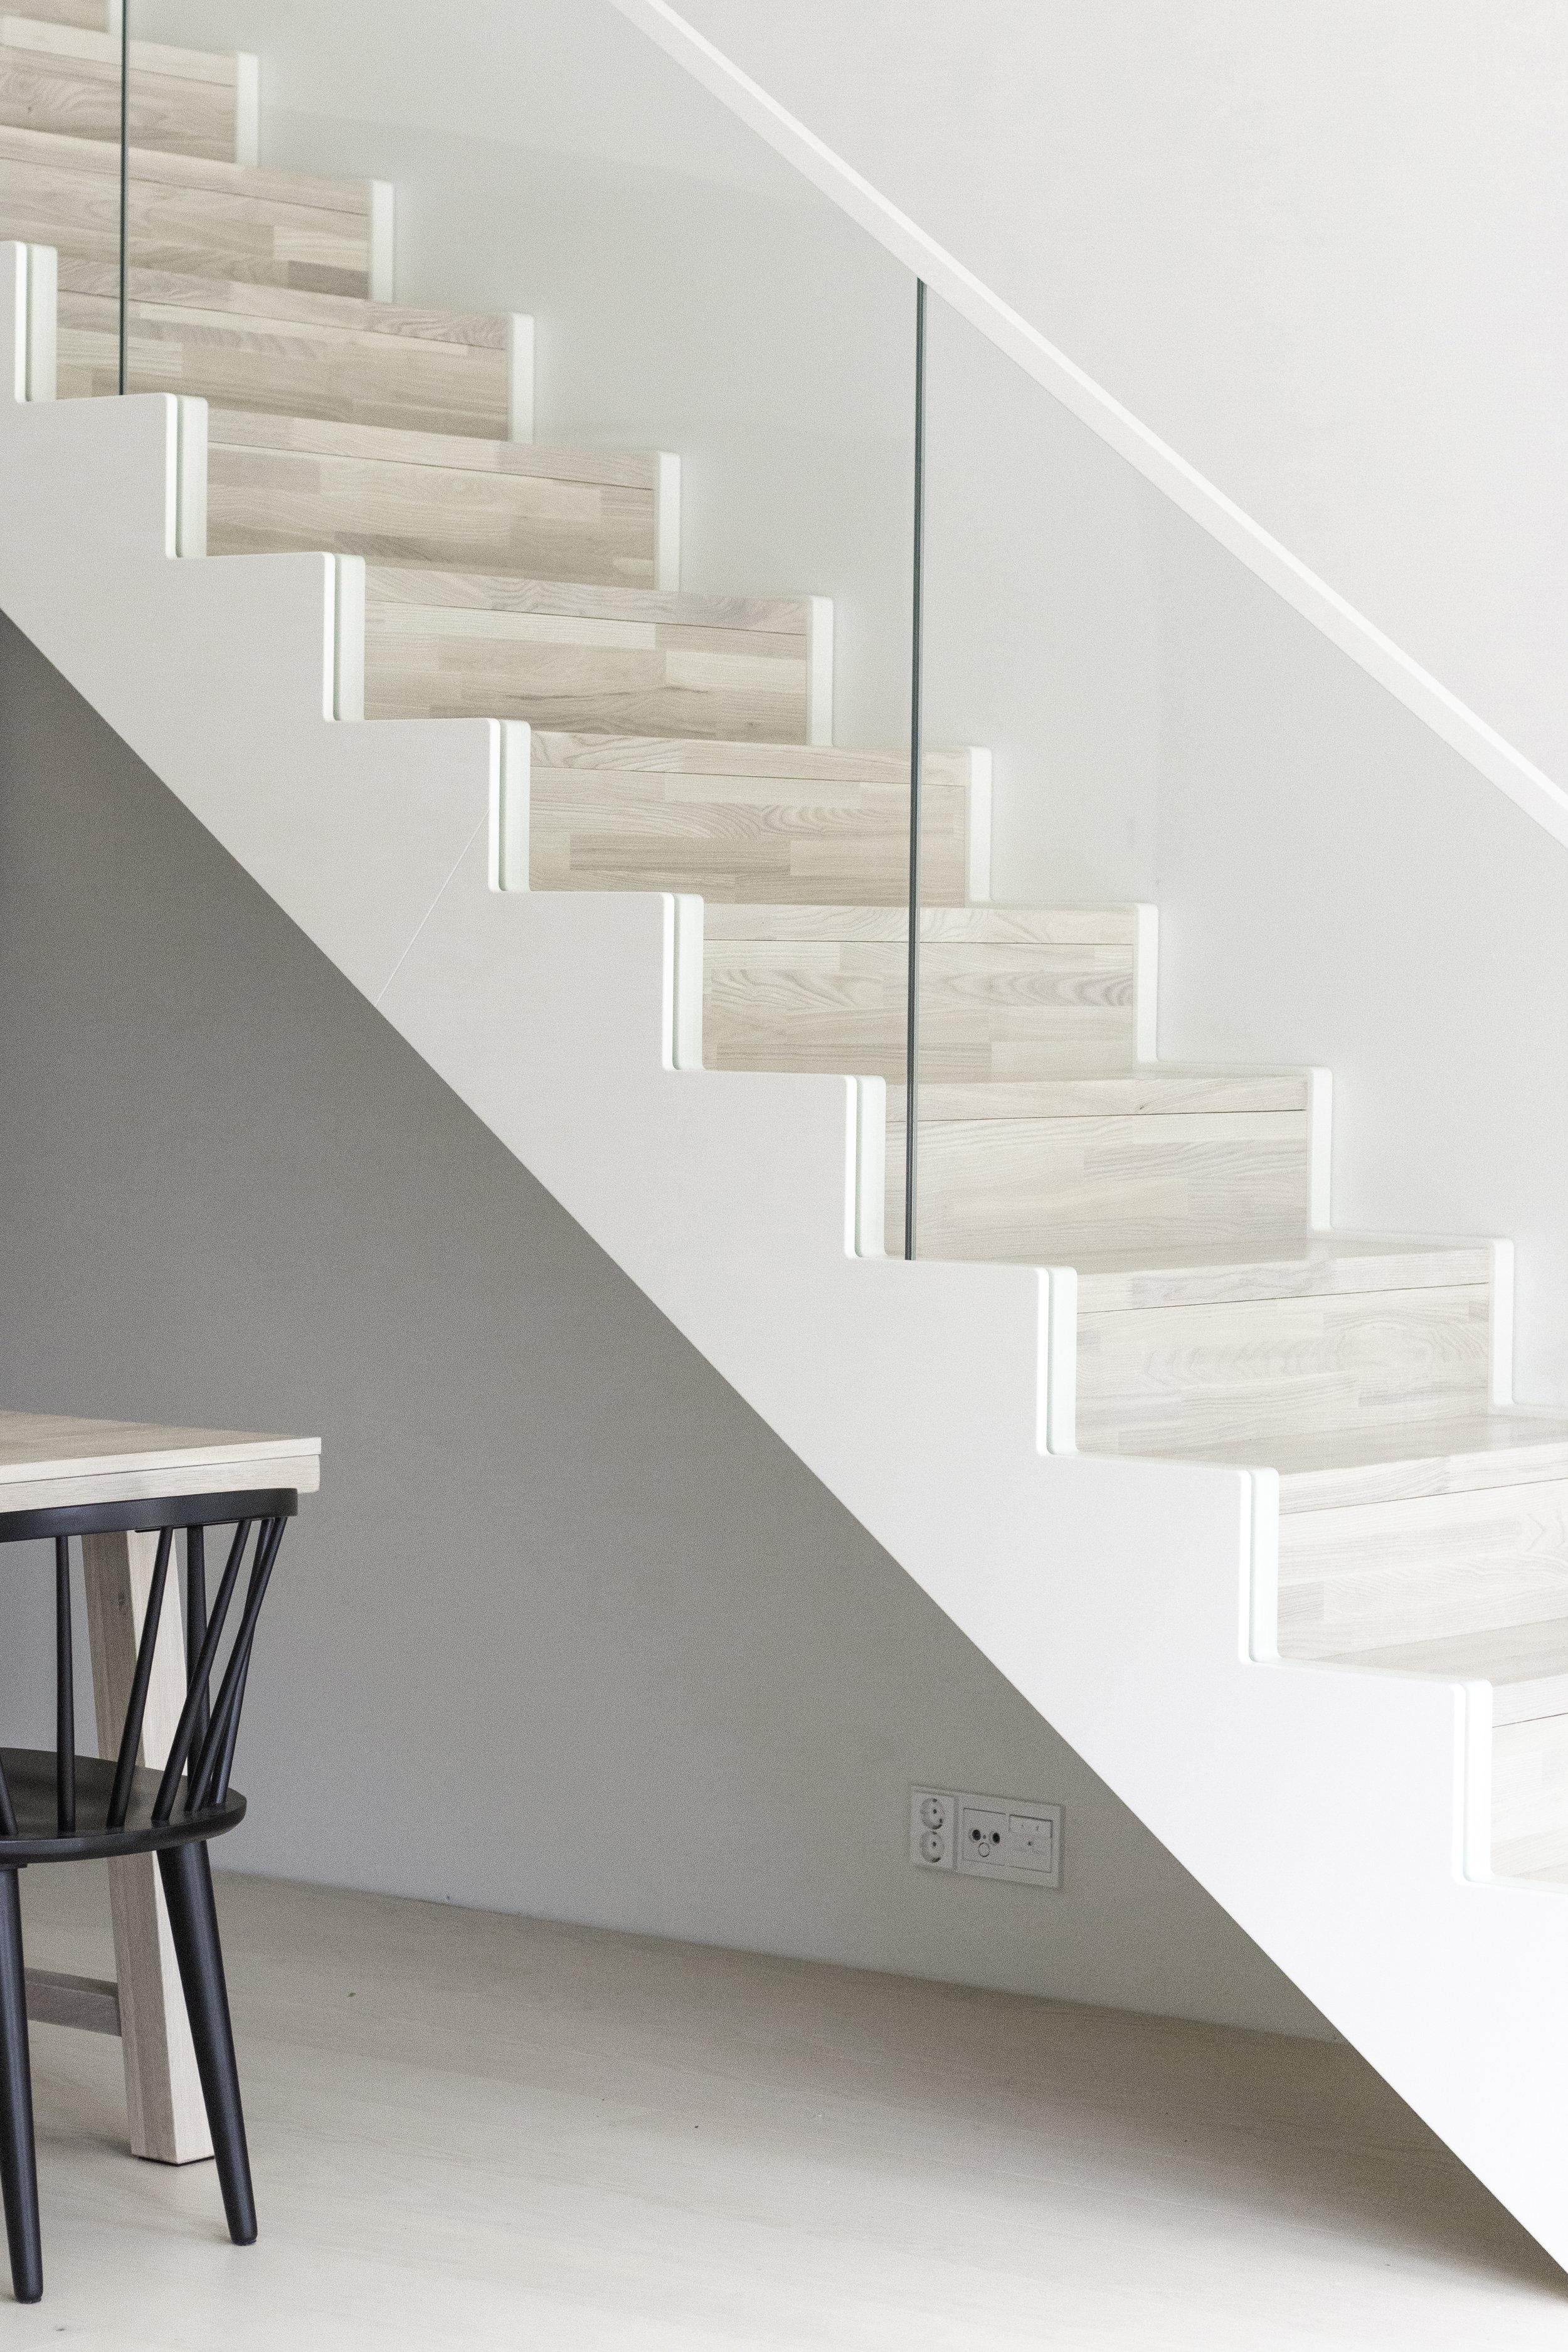 Sandra-trappan by Westwood | Scandinavian minimalistic stairs | Skandinavisk trappa | Design By Sandramaria